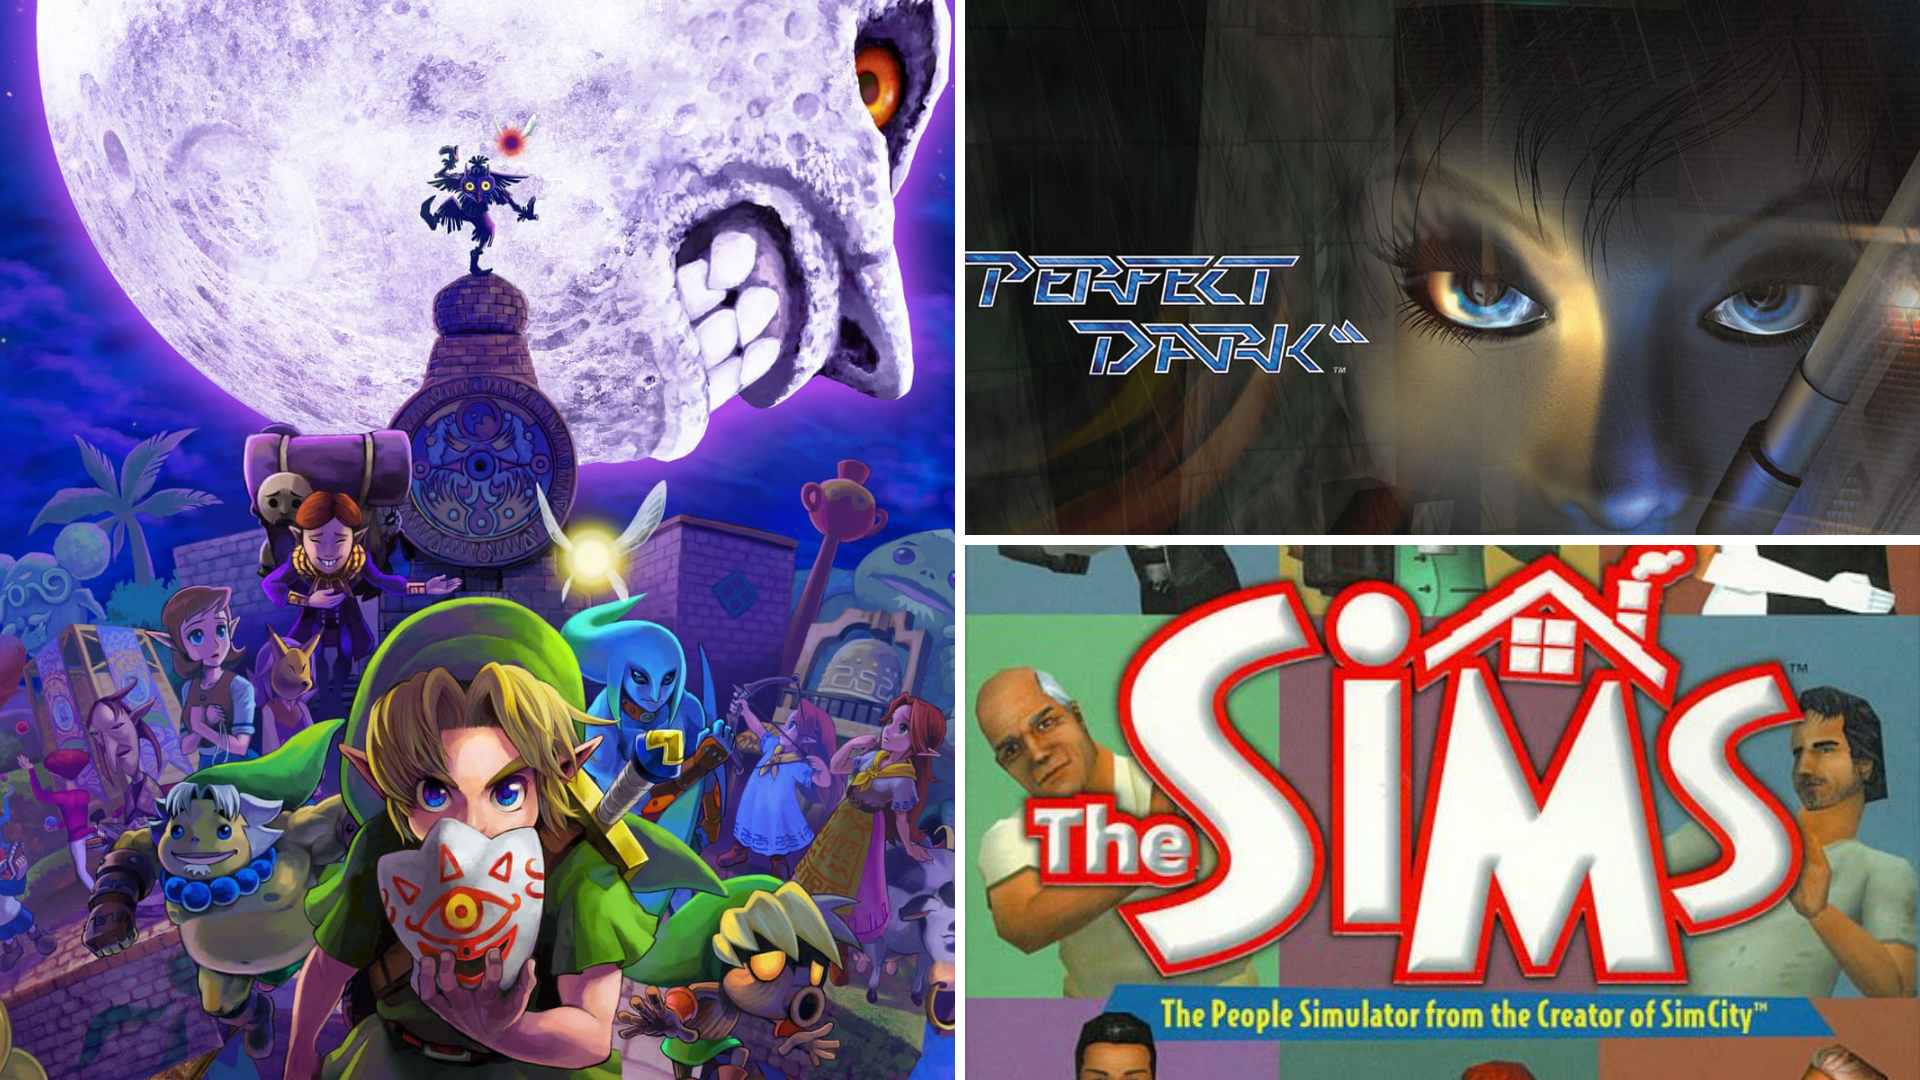 Zelda: Majora's Mask Perfect Dark The Sims